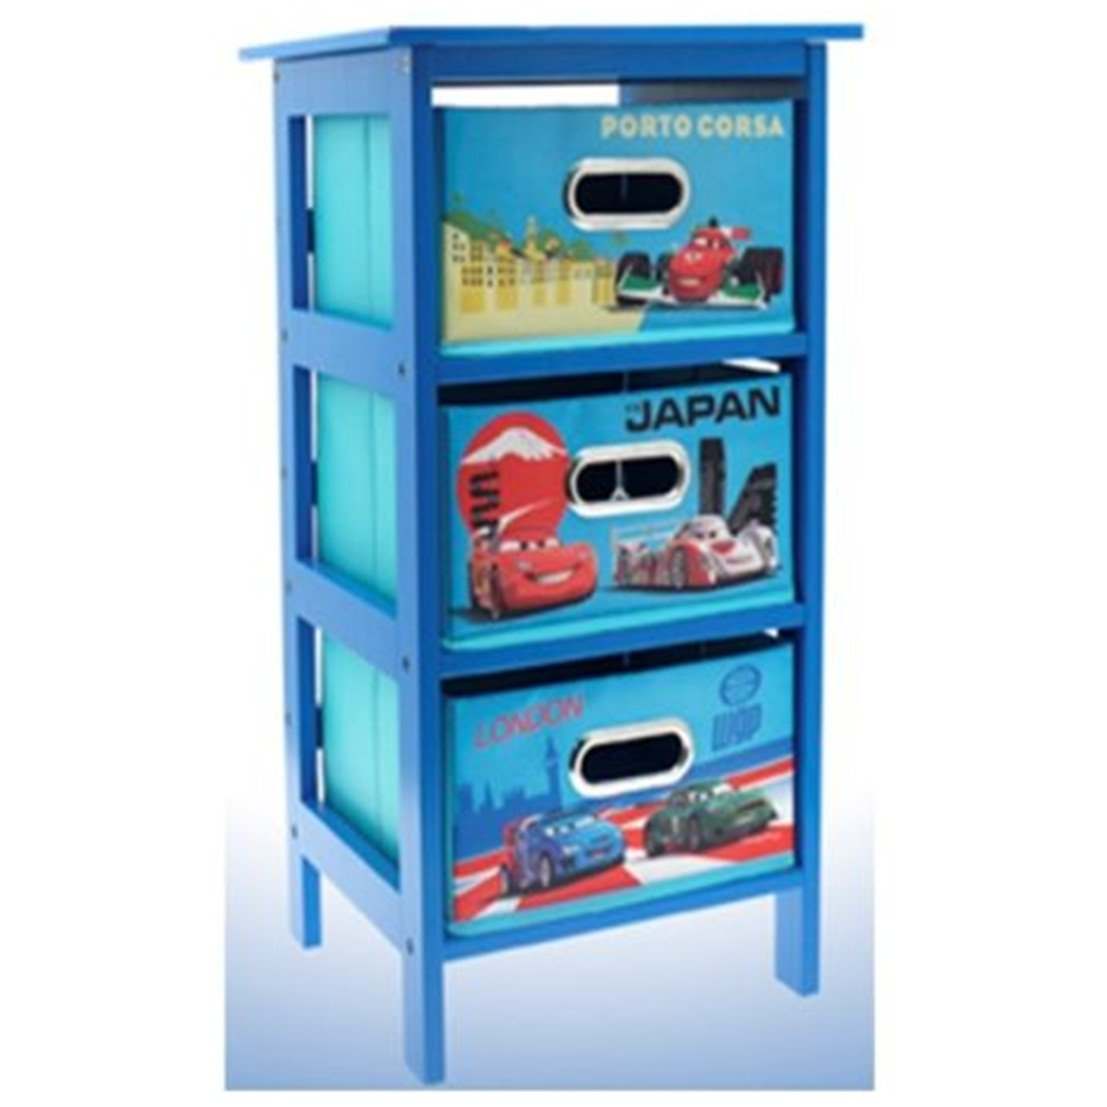 Disney Cars 2 Storage Cabinet 3 Drawer Bedroom Toys Cloths Kids Blue Furniture Amazon Co Uk Kitchen Home